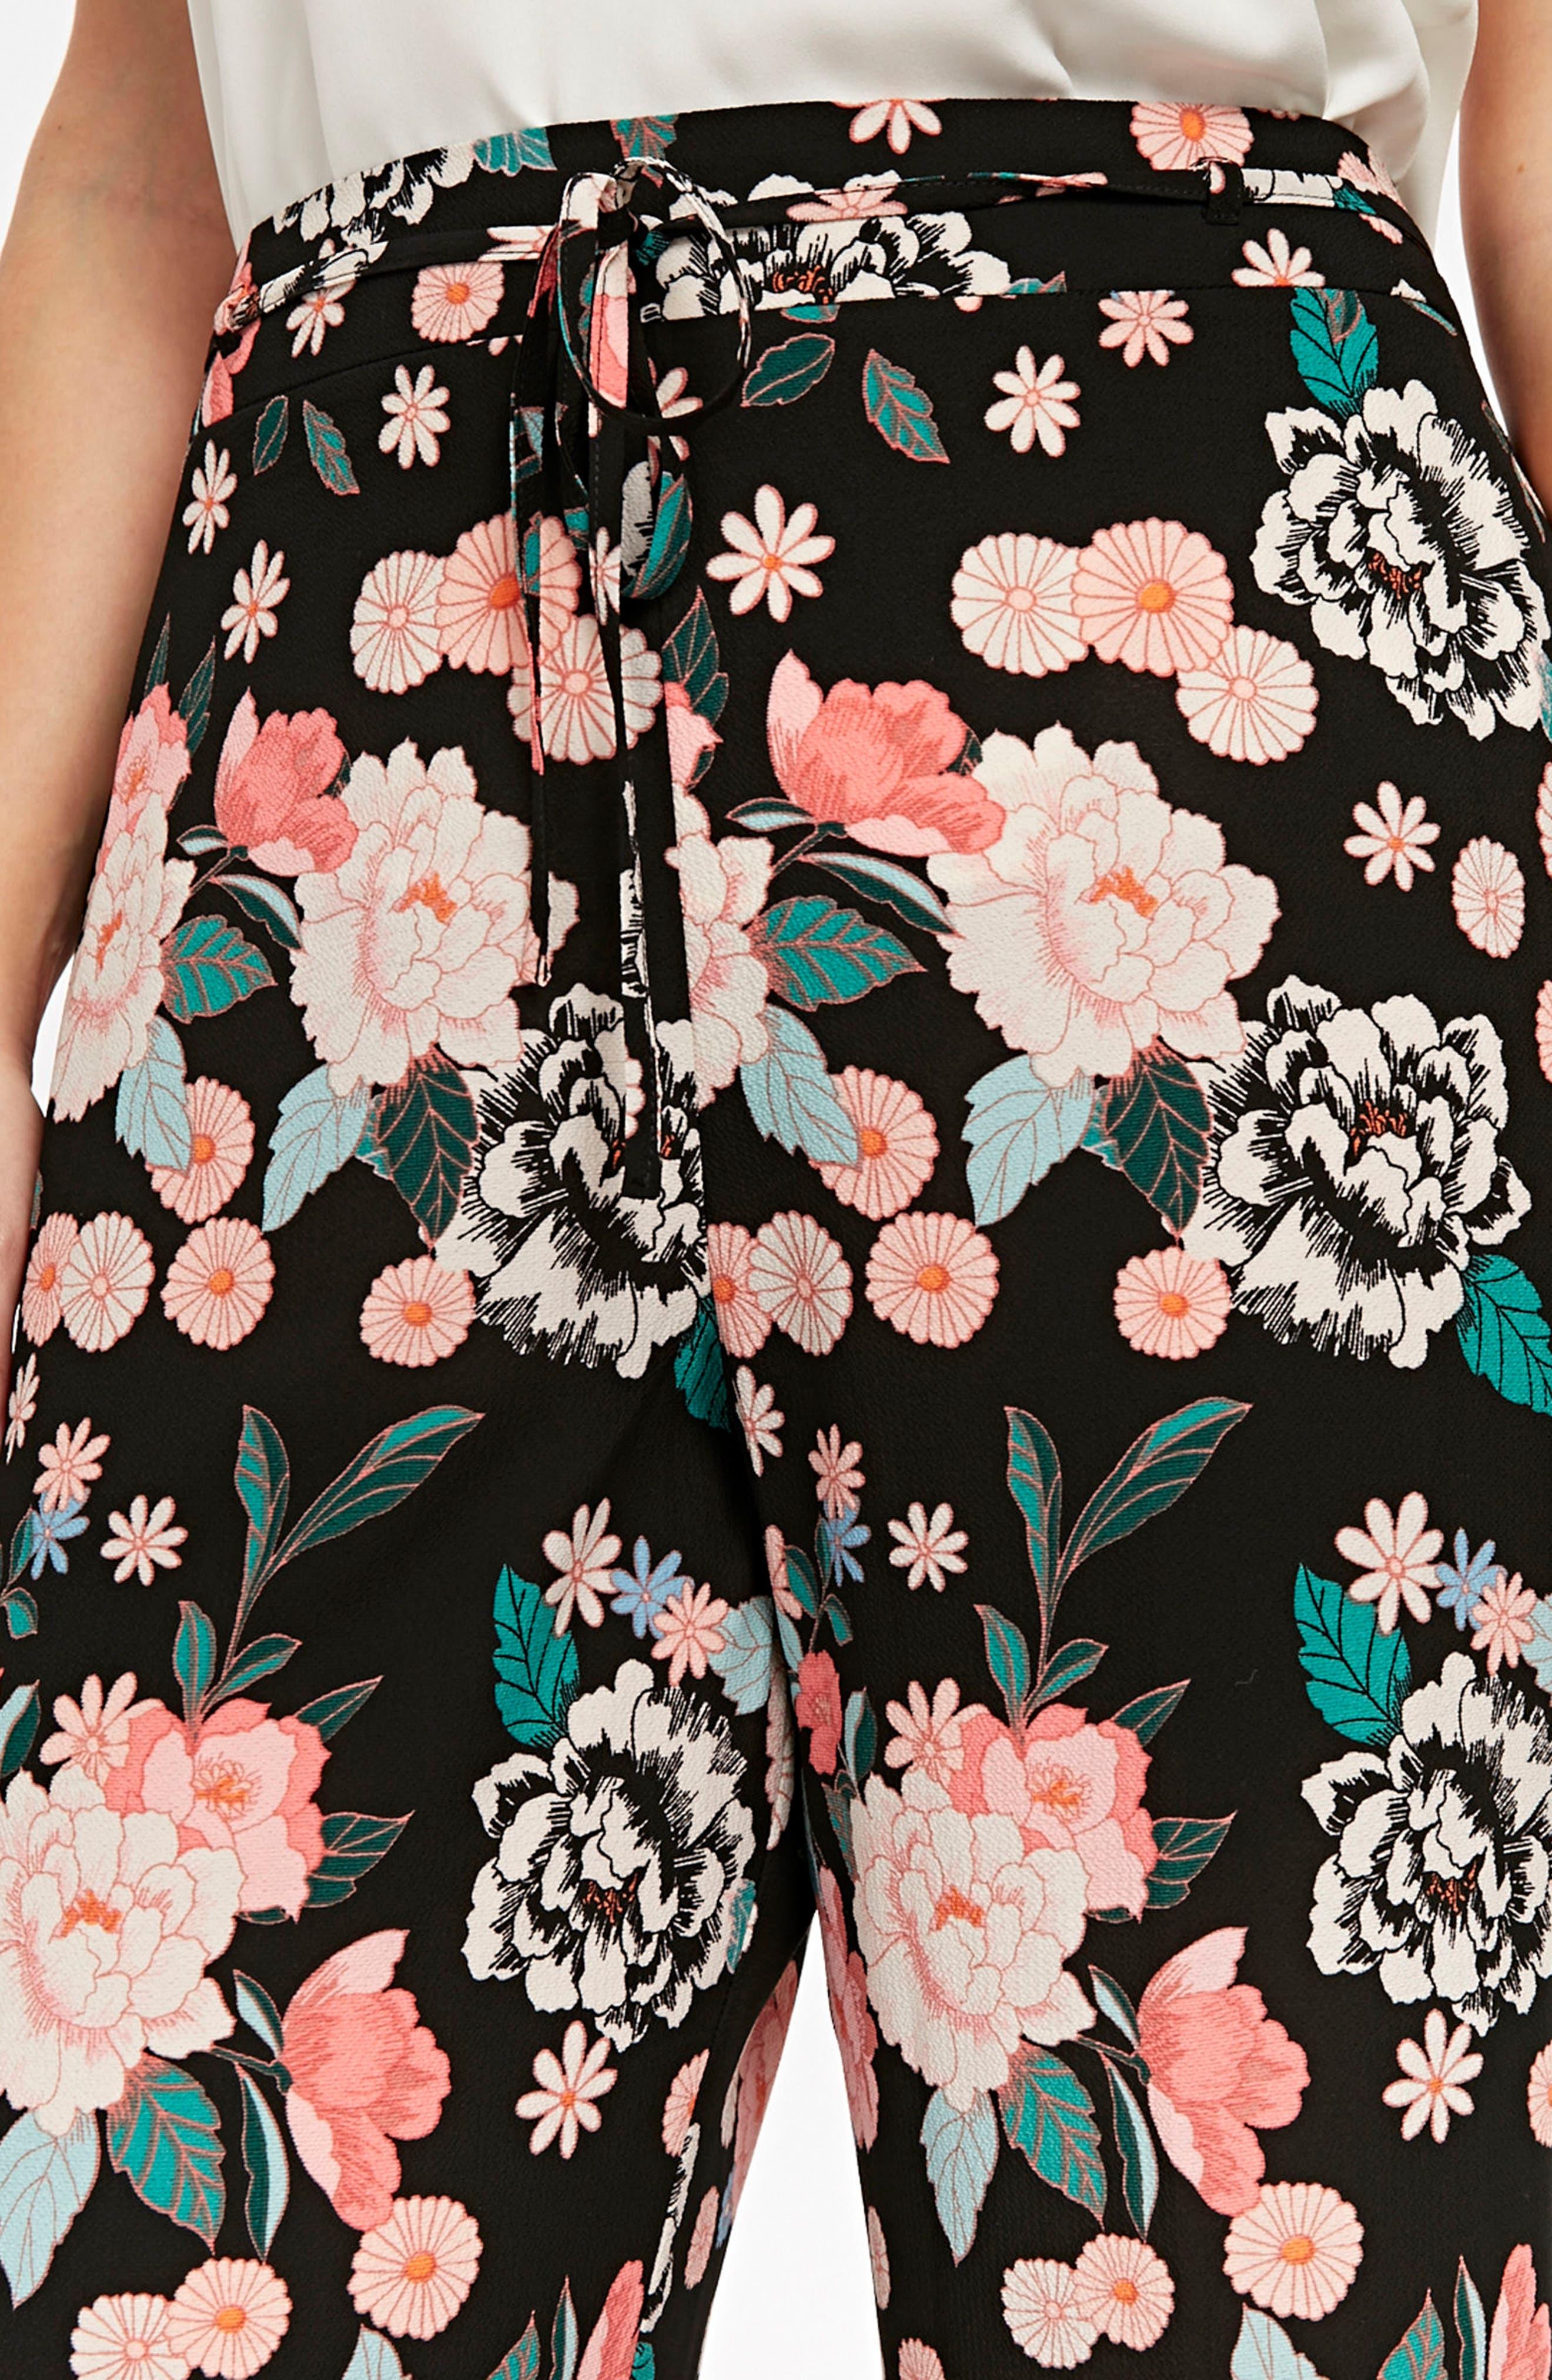 Border Floral Wide Leg Pants,                             Alternate thumbnail 2, color,                             Black